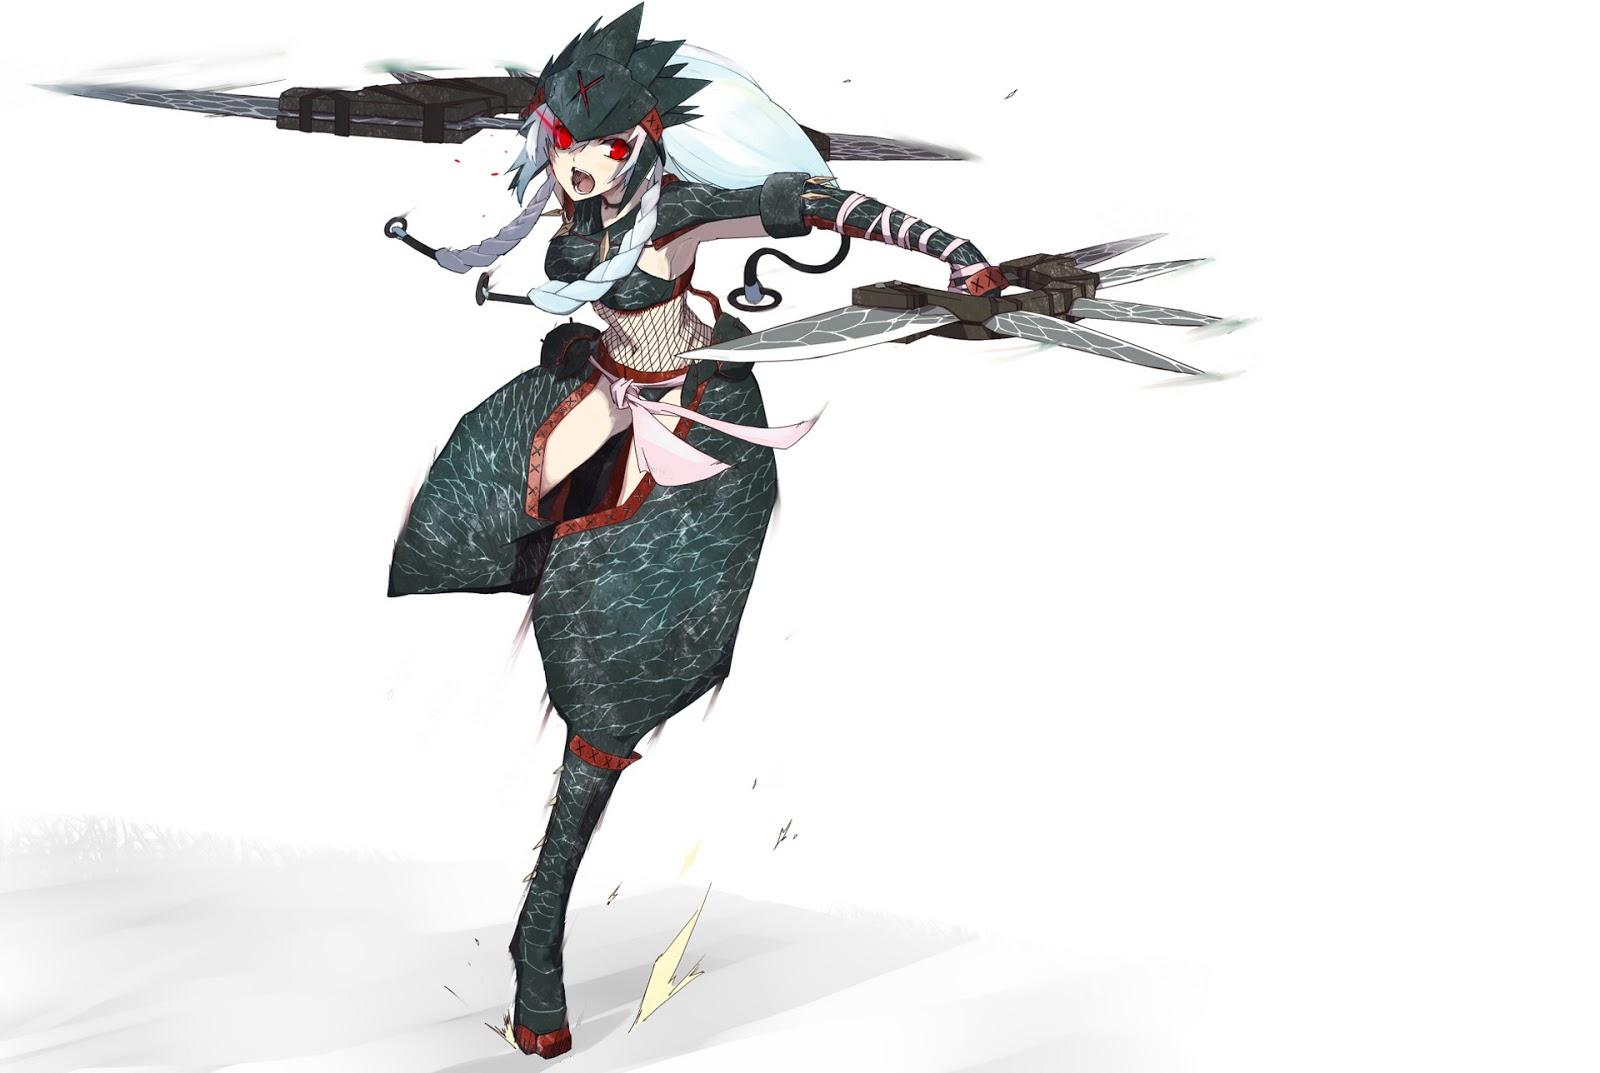 Ninja Suit Dagger Weapon Female Girl Anime HD Wallpaper Desktop PC    Ninja Weapons Wallpaper